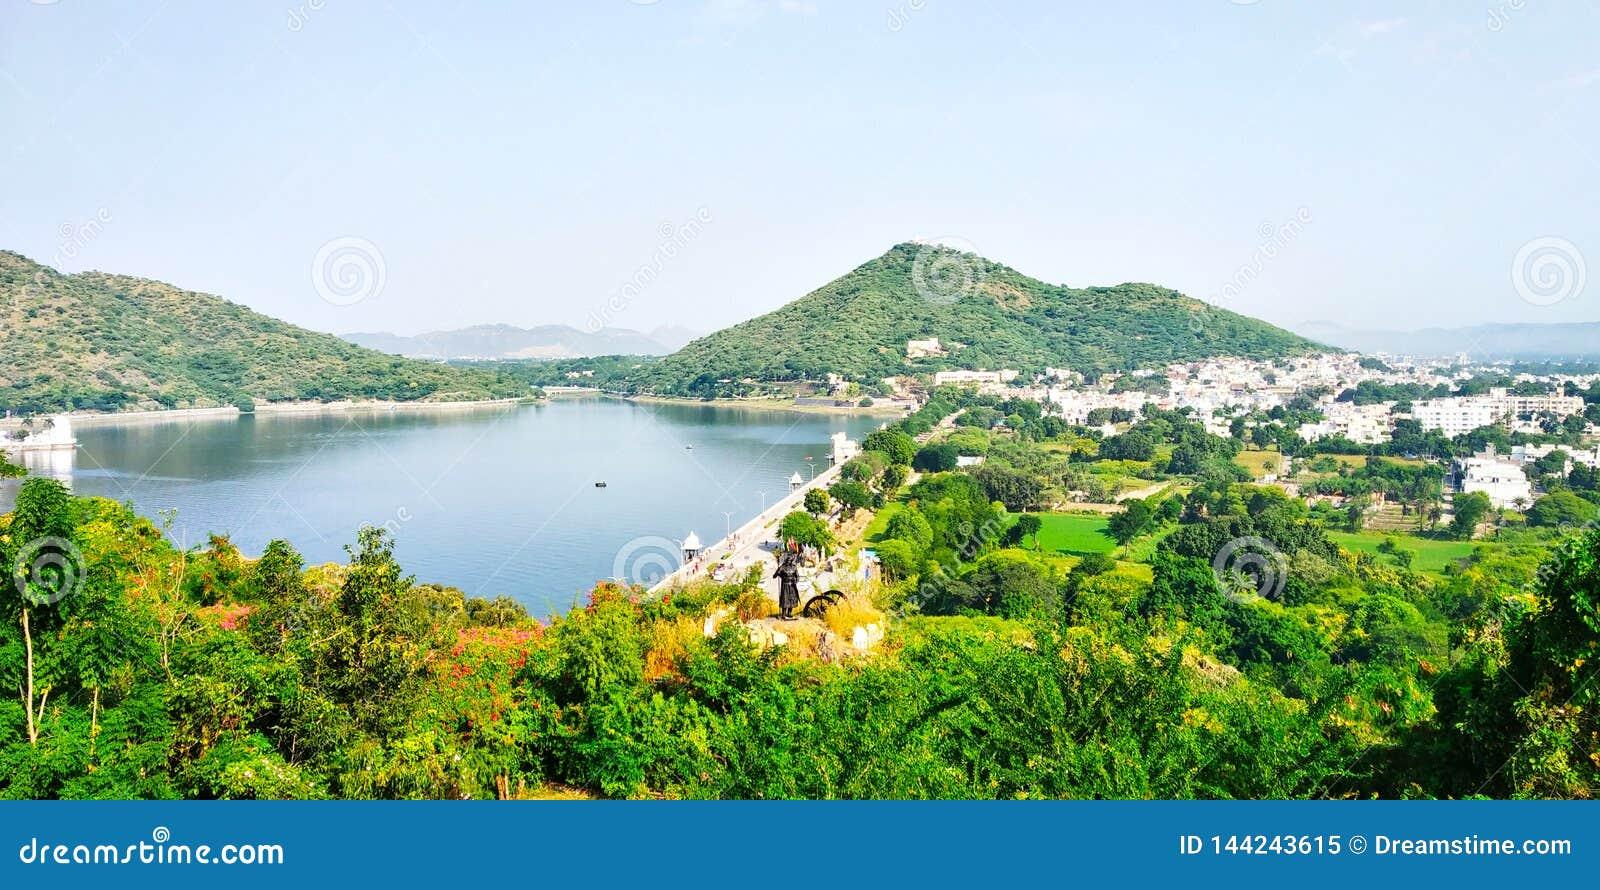 Fateh Sagar Lake Udaipur stock photo. Image of udaipur - 35987332